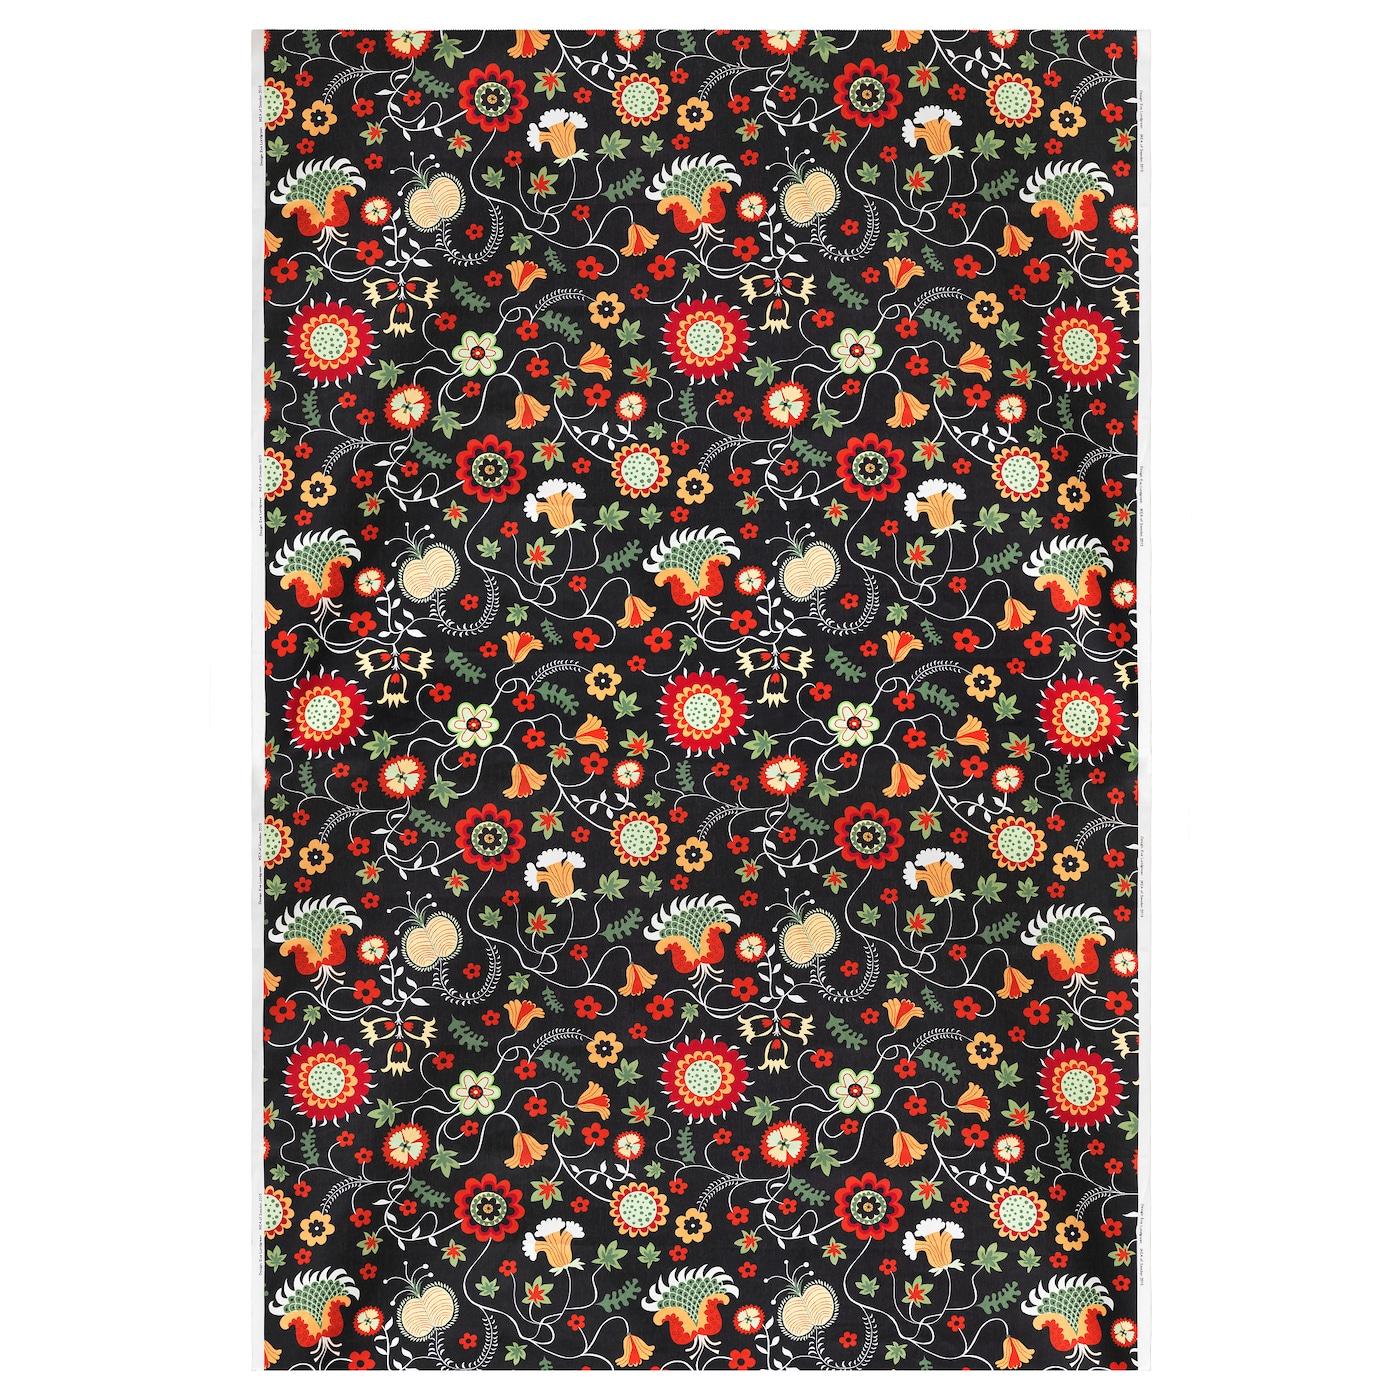 Ikea Rosenrips Fabric